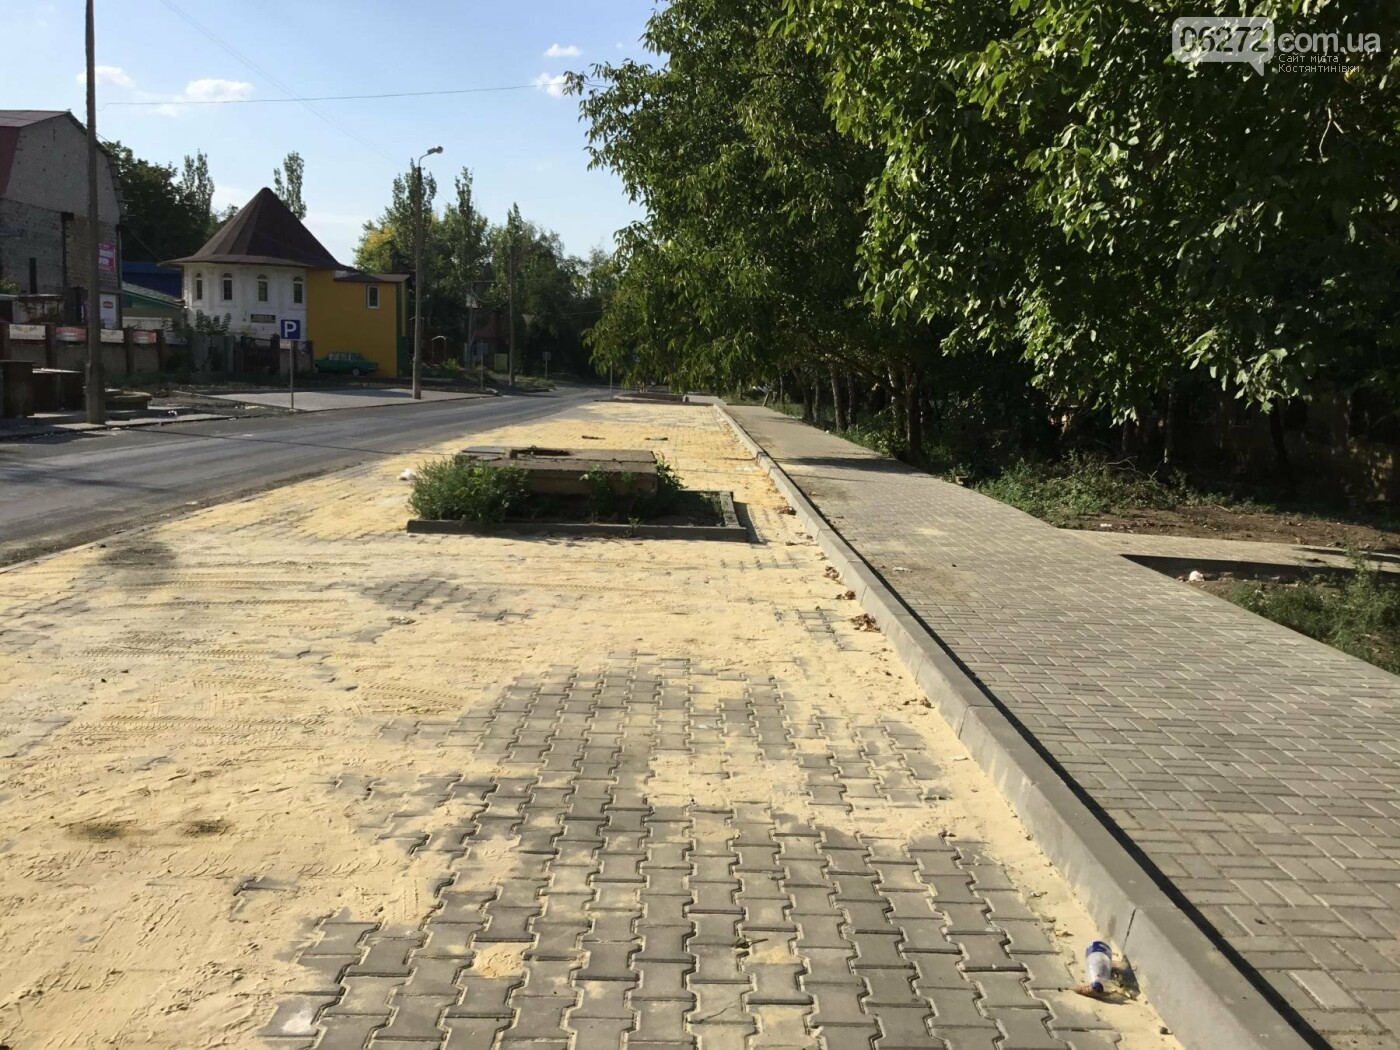 Дорога после ремонта по ул. Леваневского в Константиновке, фото-15